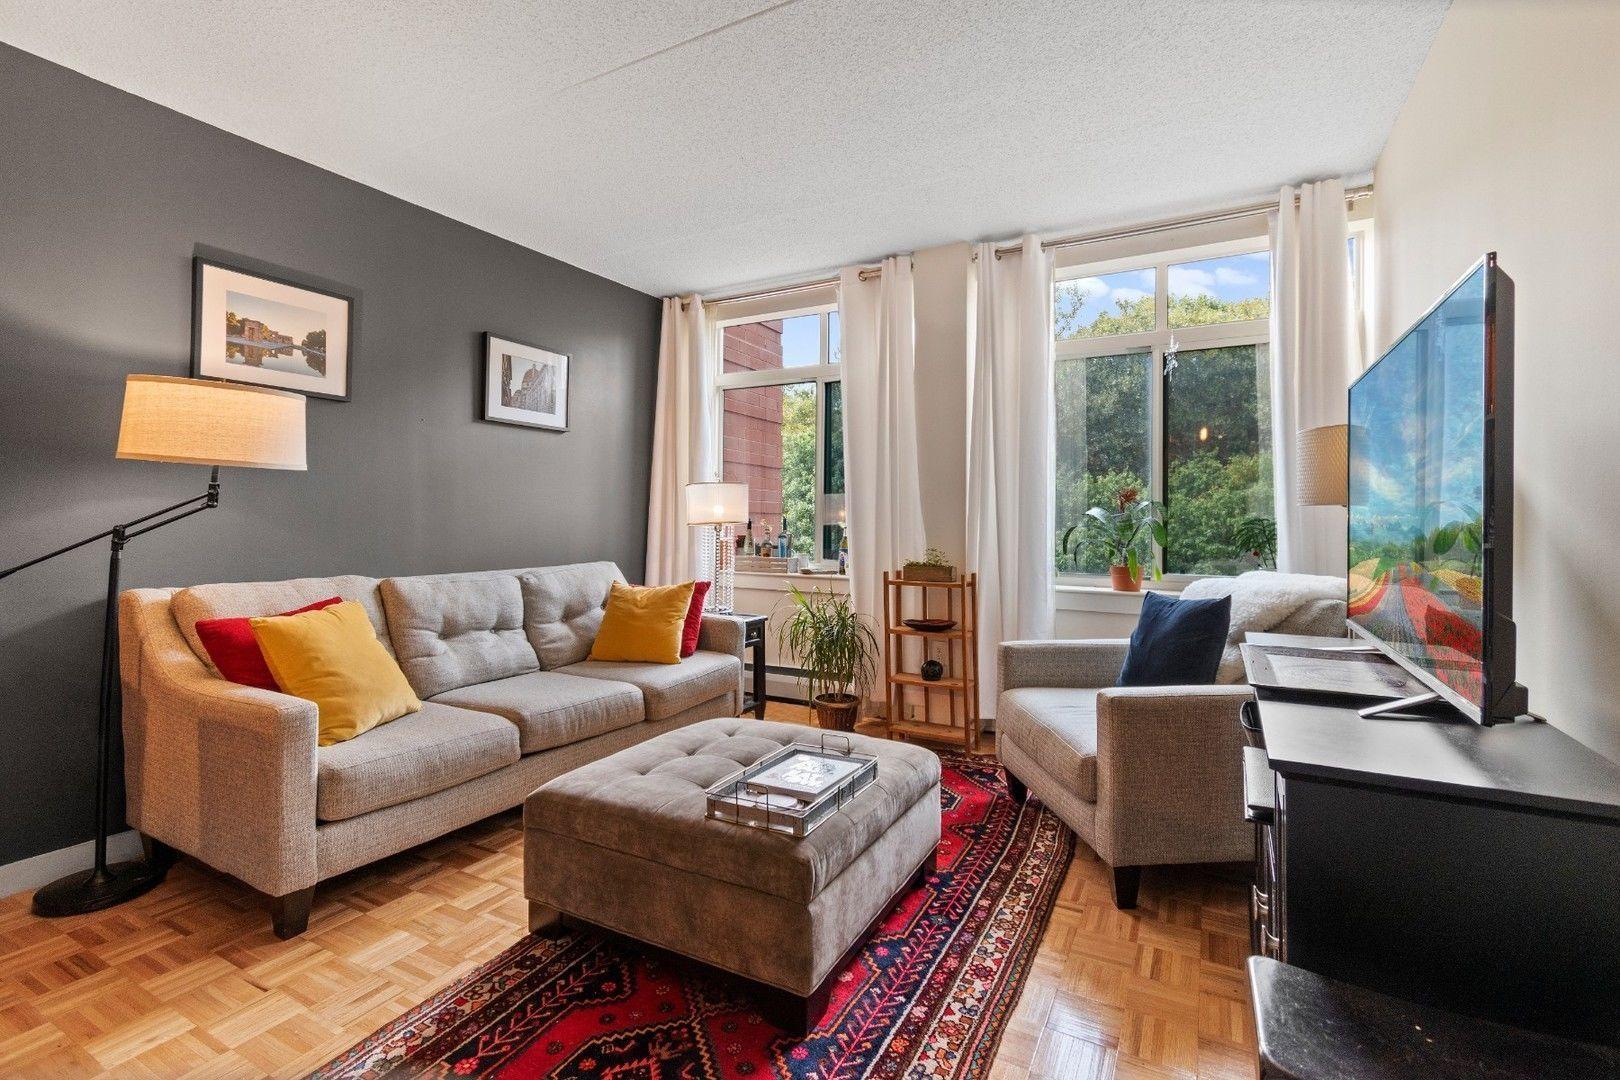 Apartment for sale at 130 Bradhurst Avenue, Apt 703